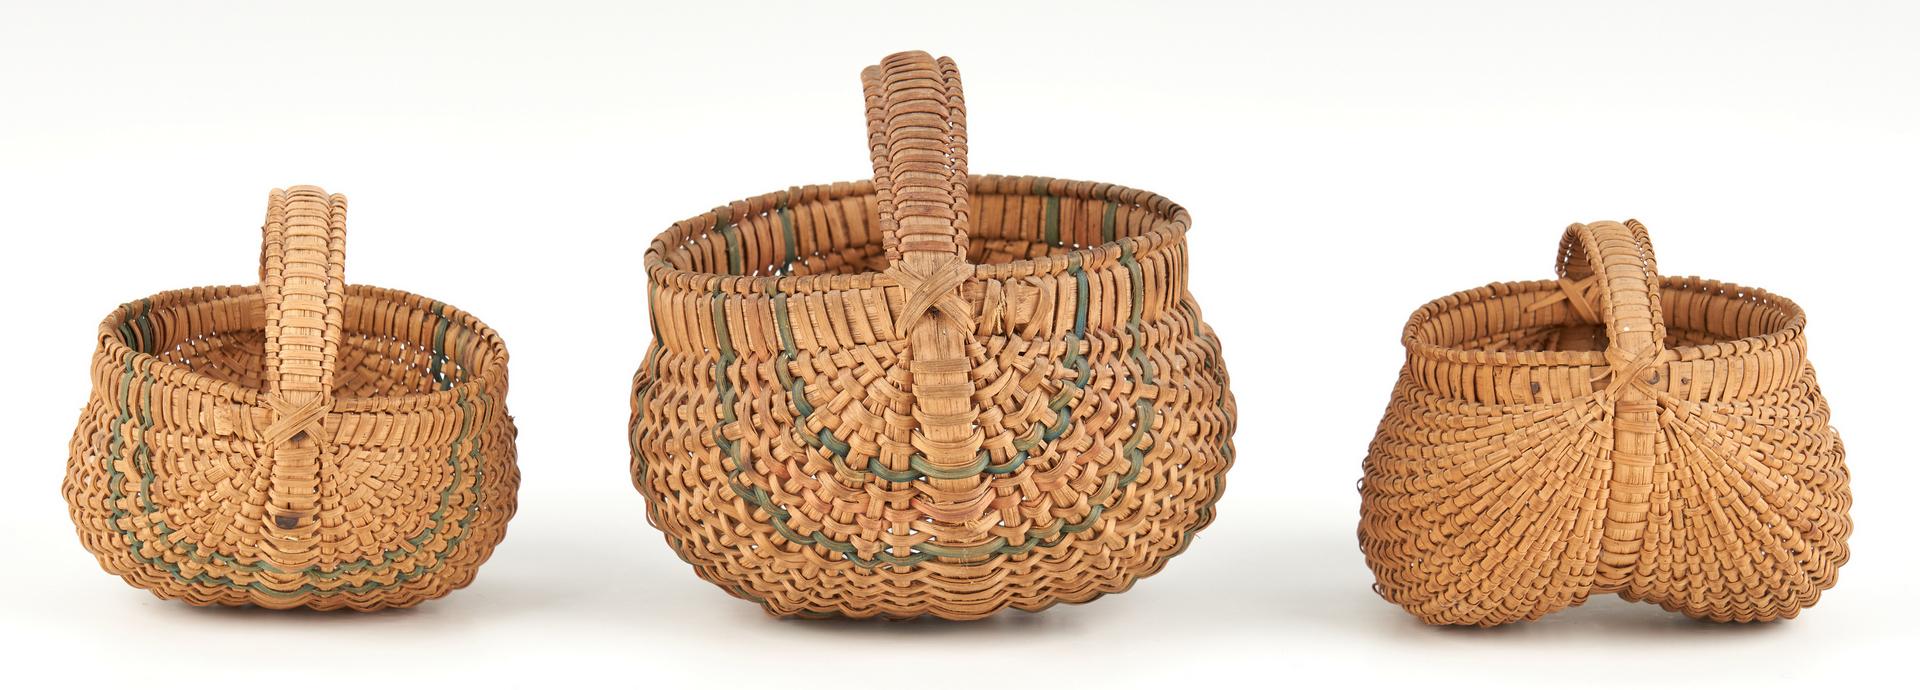 Lot 203: 3 Miniature Virginia Buttocks Baskets